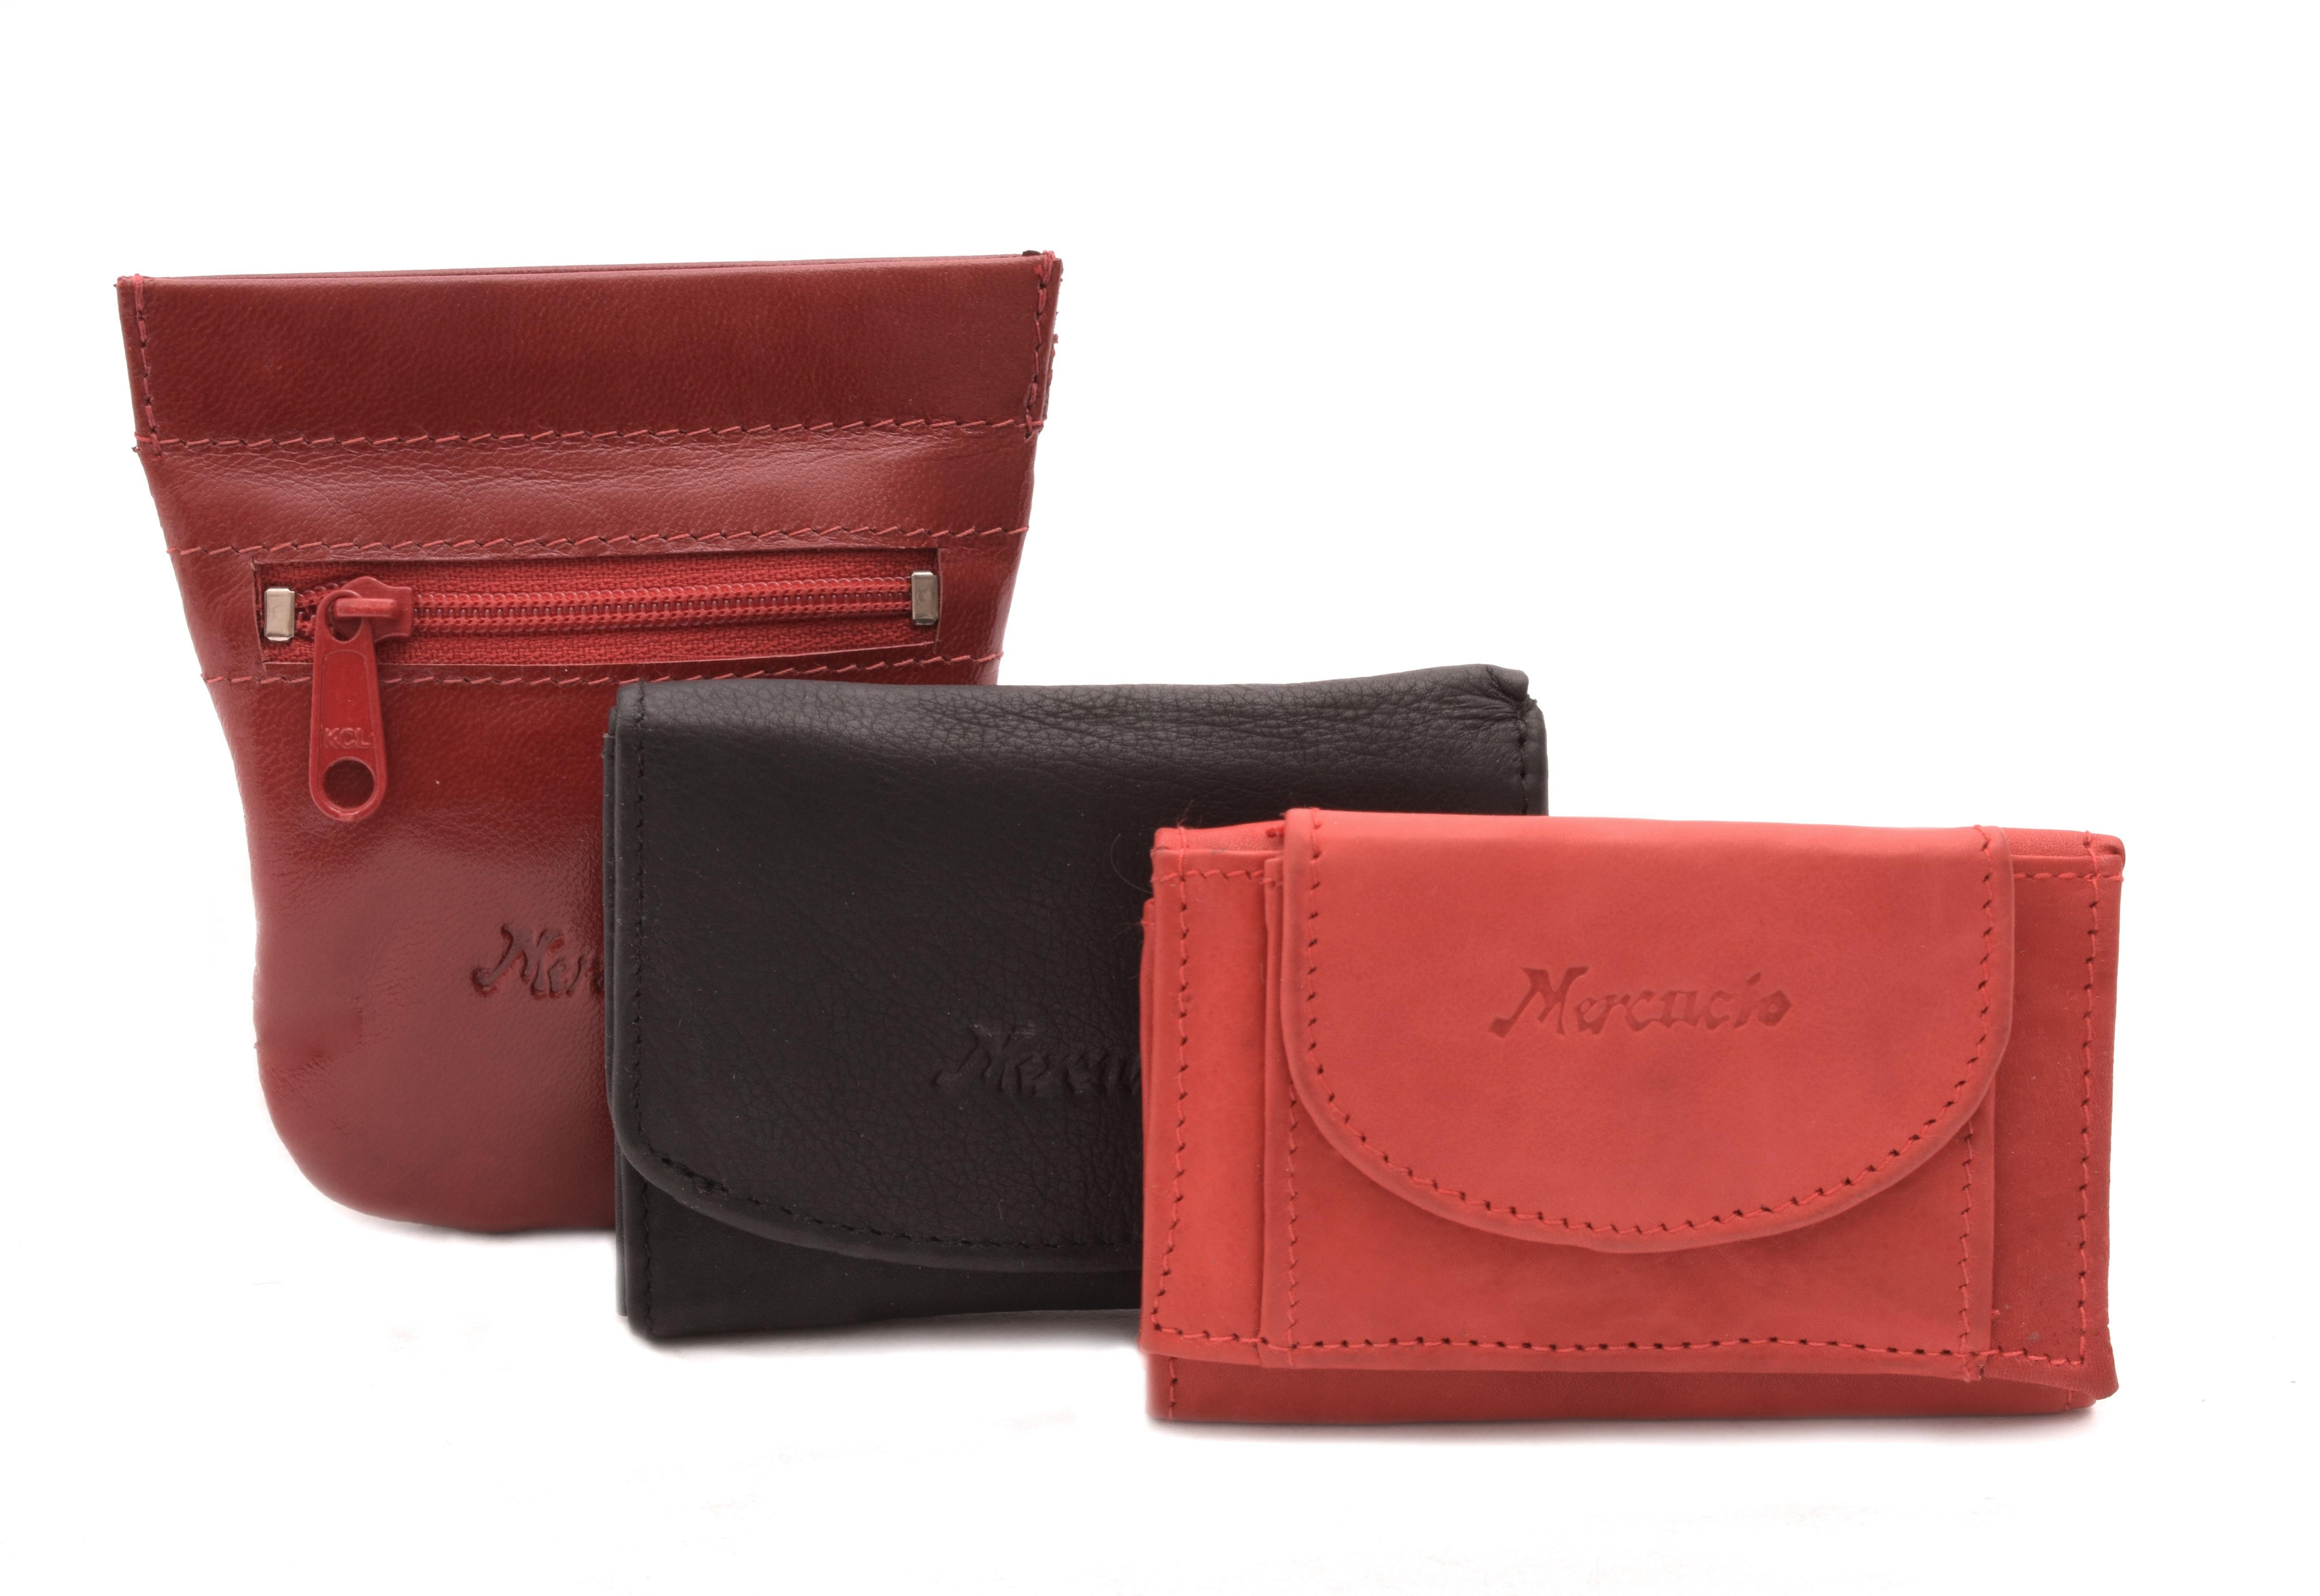 Mercucio -dámske peňaženky